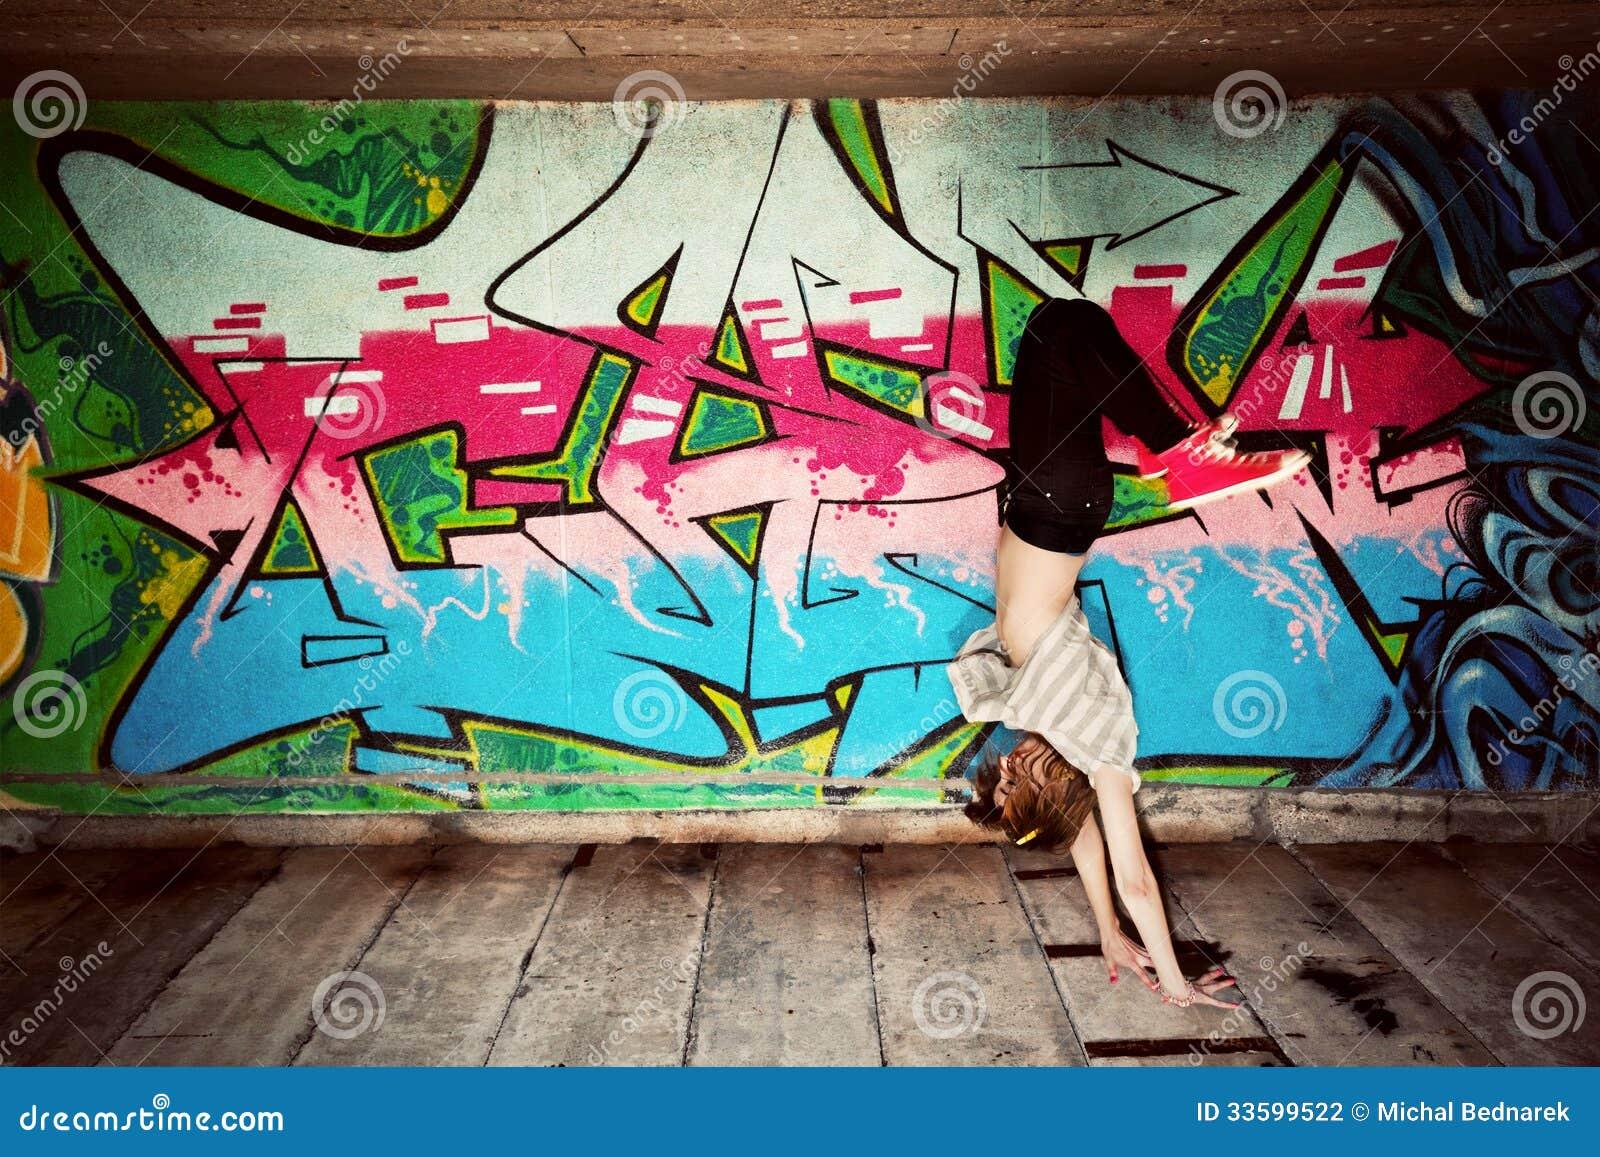 the trend of graffiti - photo #16